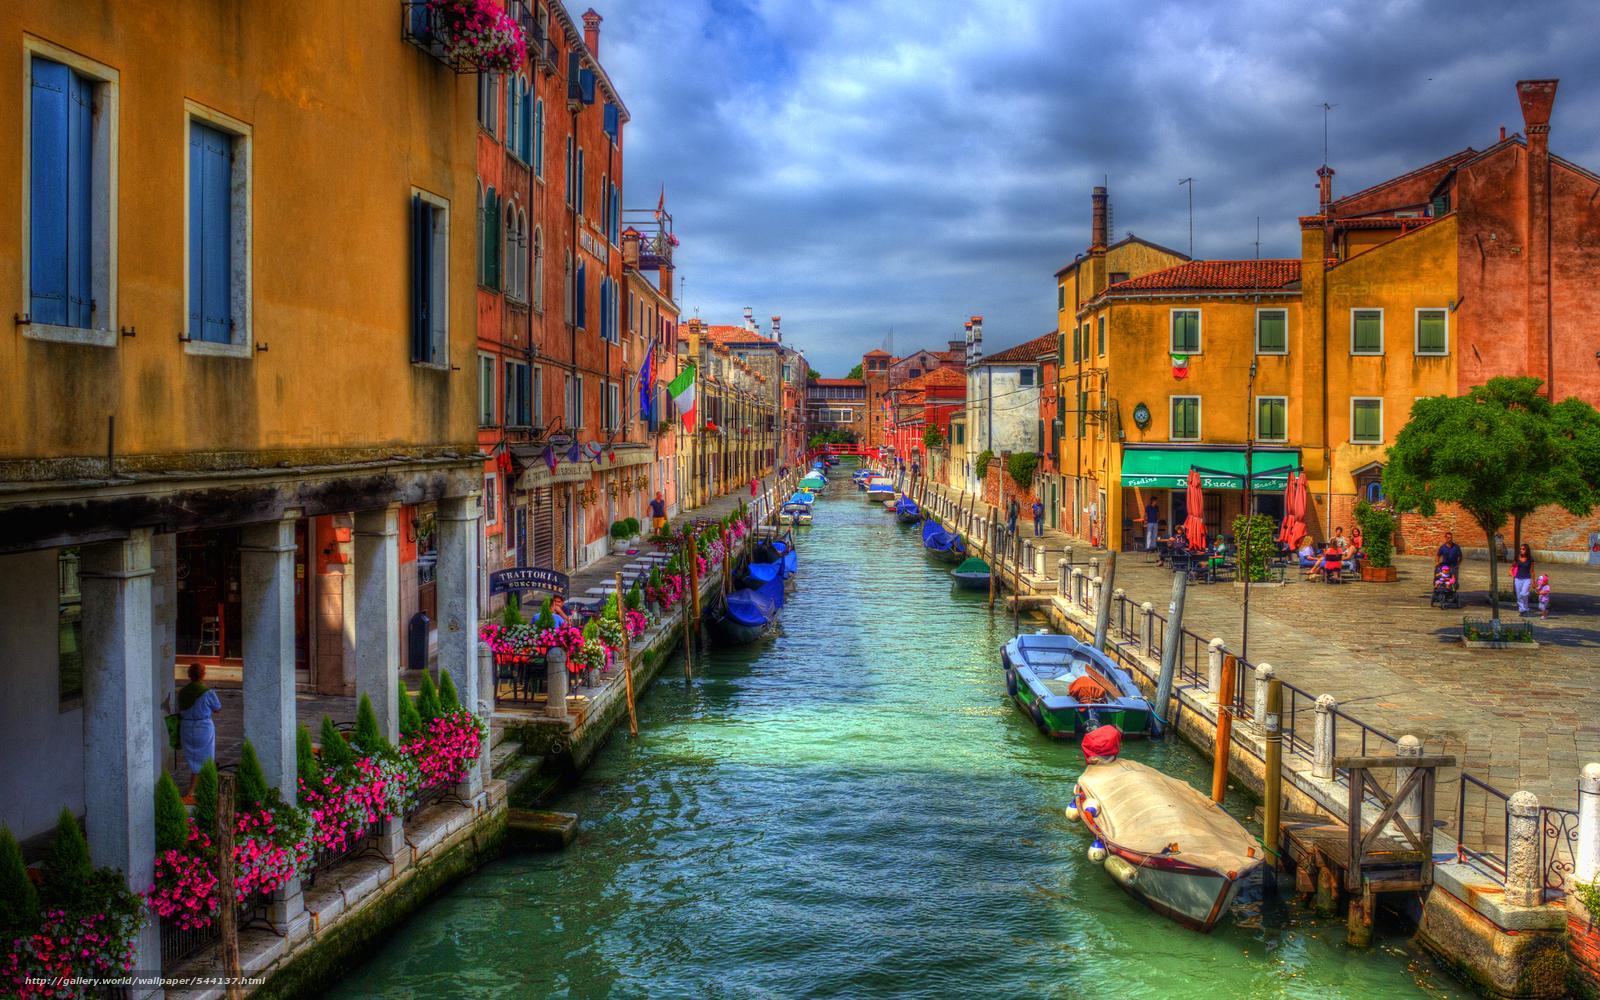 venise italie wallpaper - photo #27